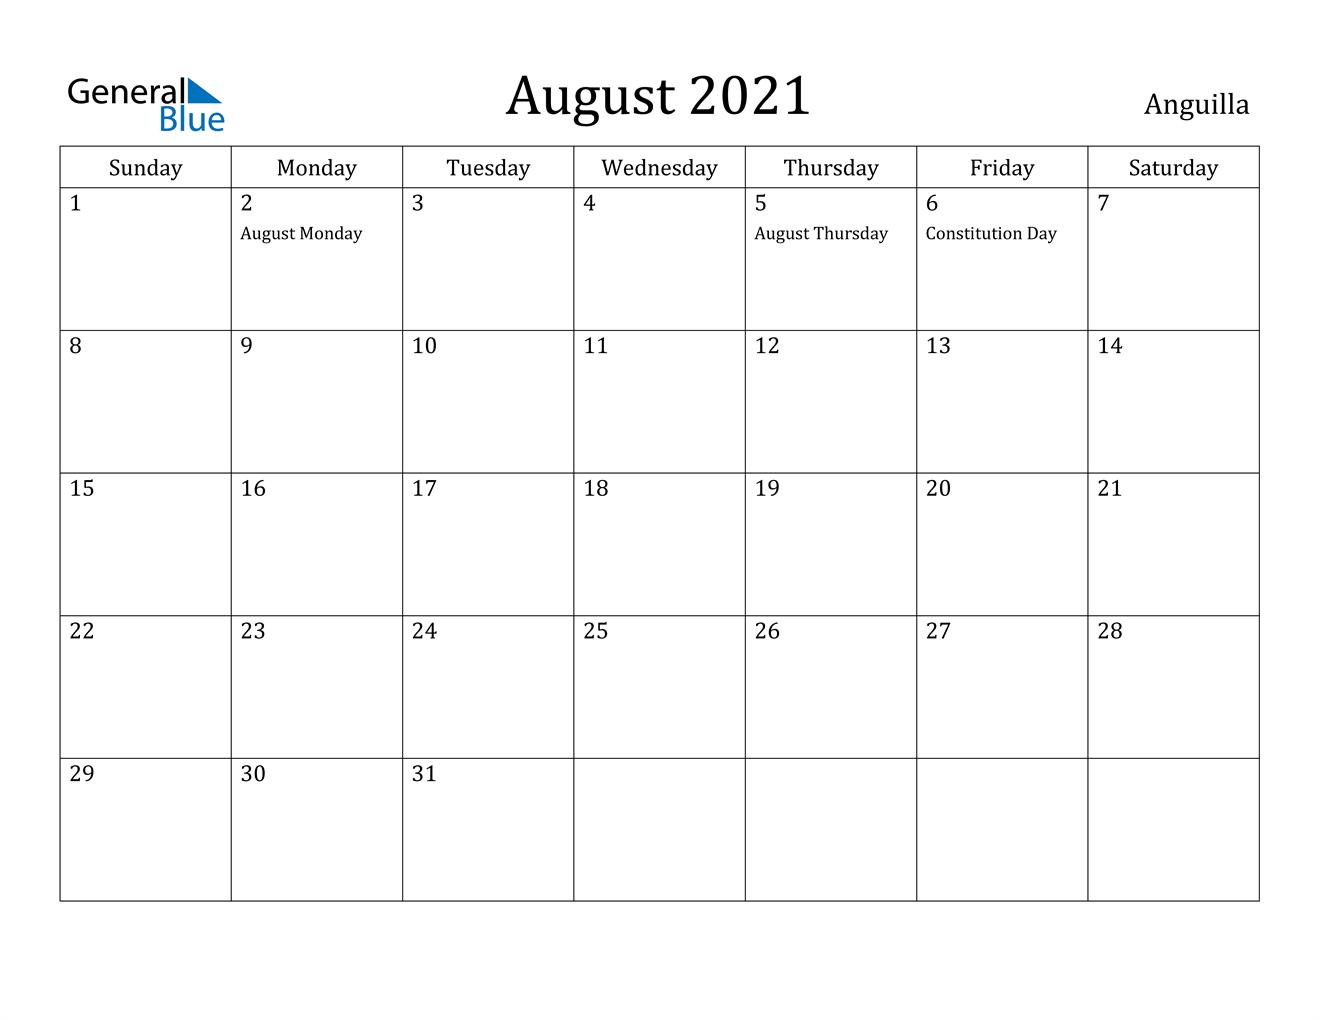 August 2021 whacky holiday calendar. August 2021 Calendar - Anguilla